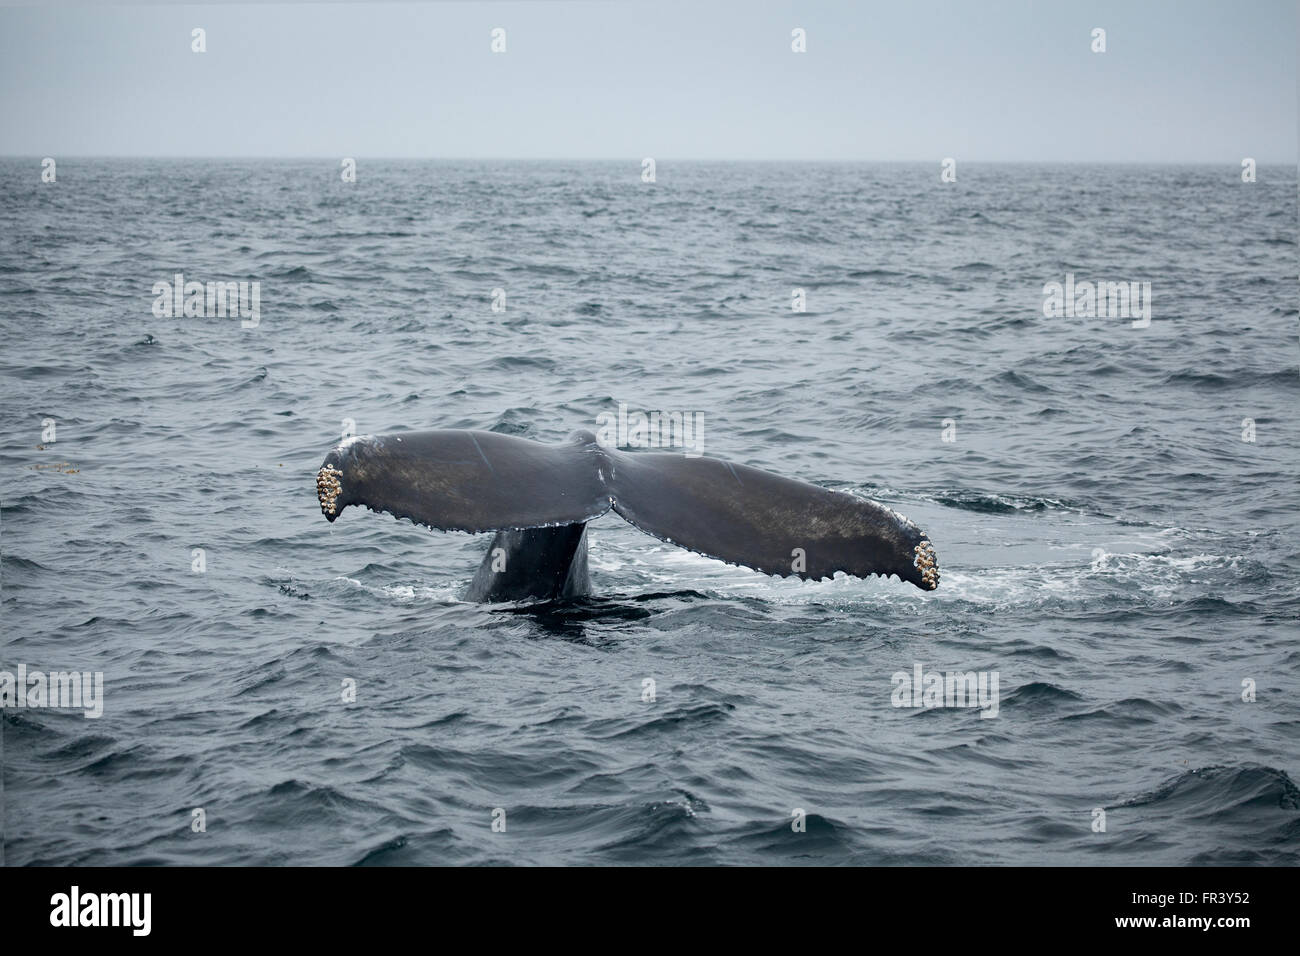 Cola de ballena jorobada. Foto de stock